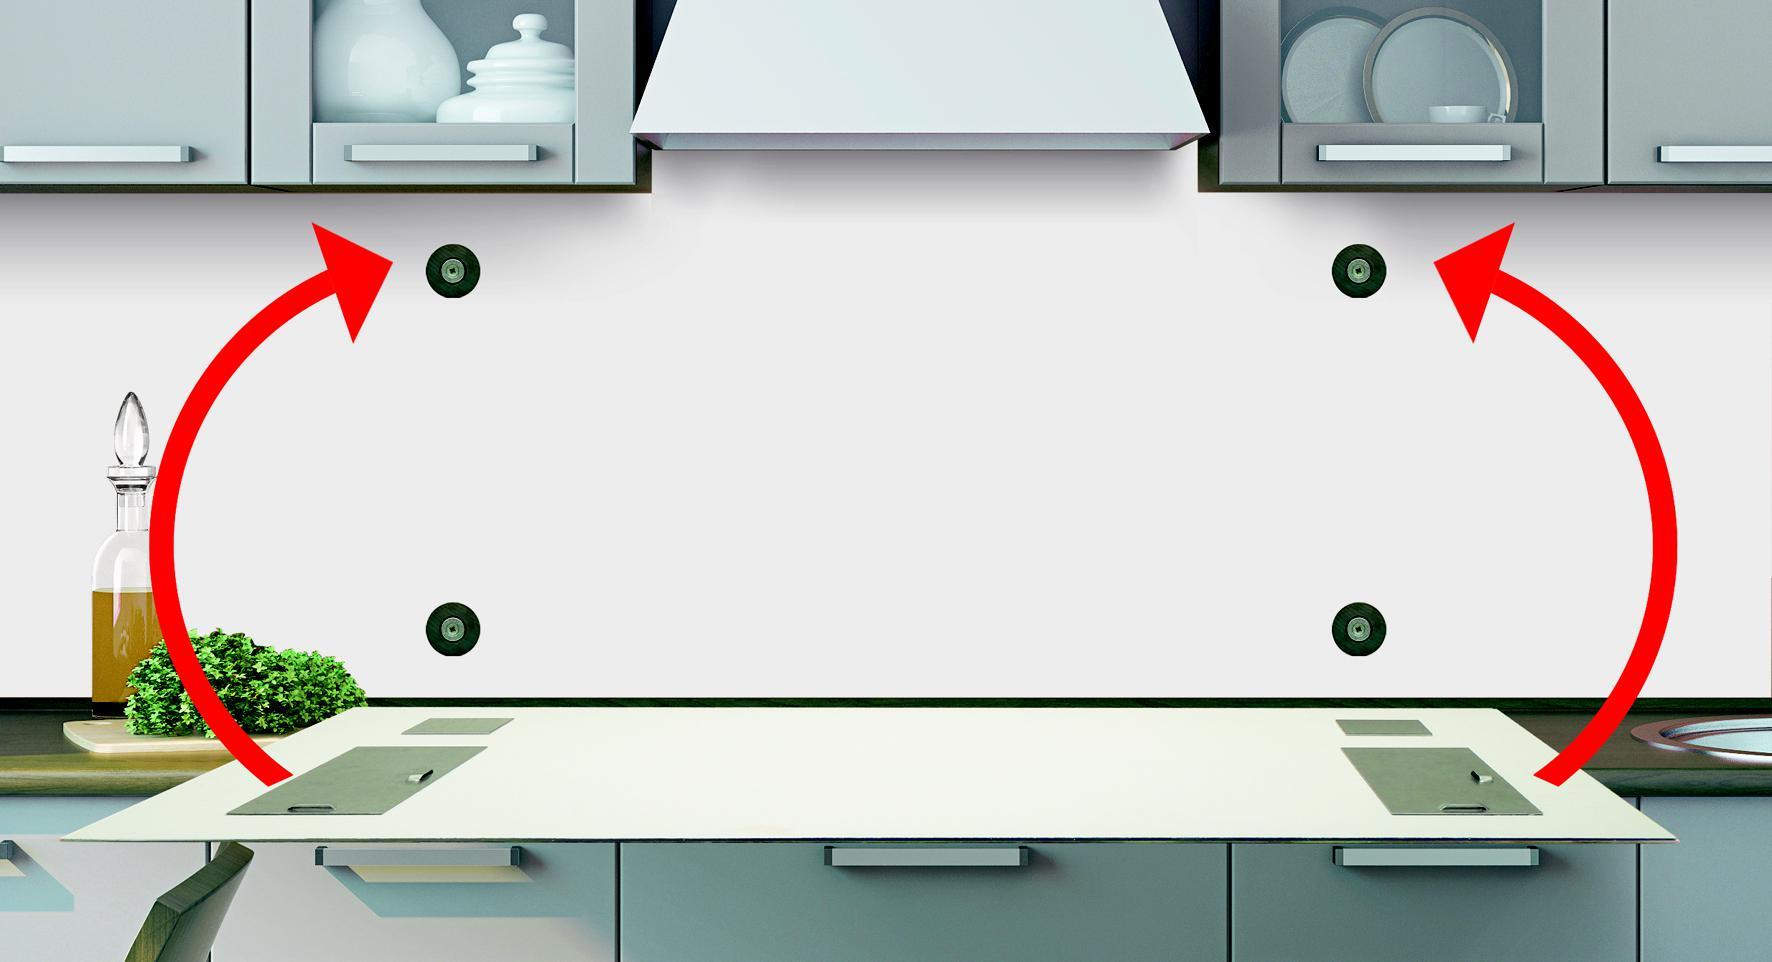 Full Size of Rückwand Küche Selbst Gestalten Rückwand Küche Individuell Nischenrückwand Küche Befestigen Küchenrückwand Eiche Küche Nischenrückwand Küche